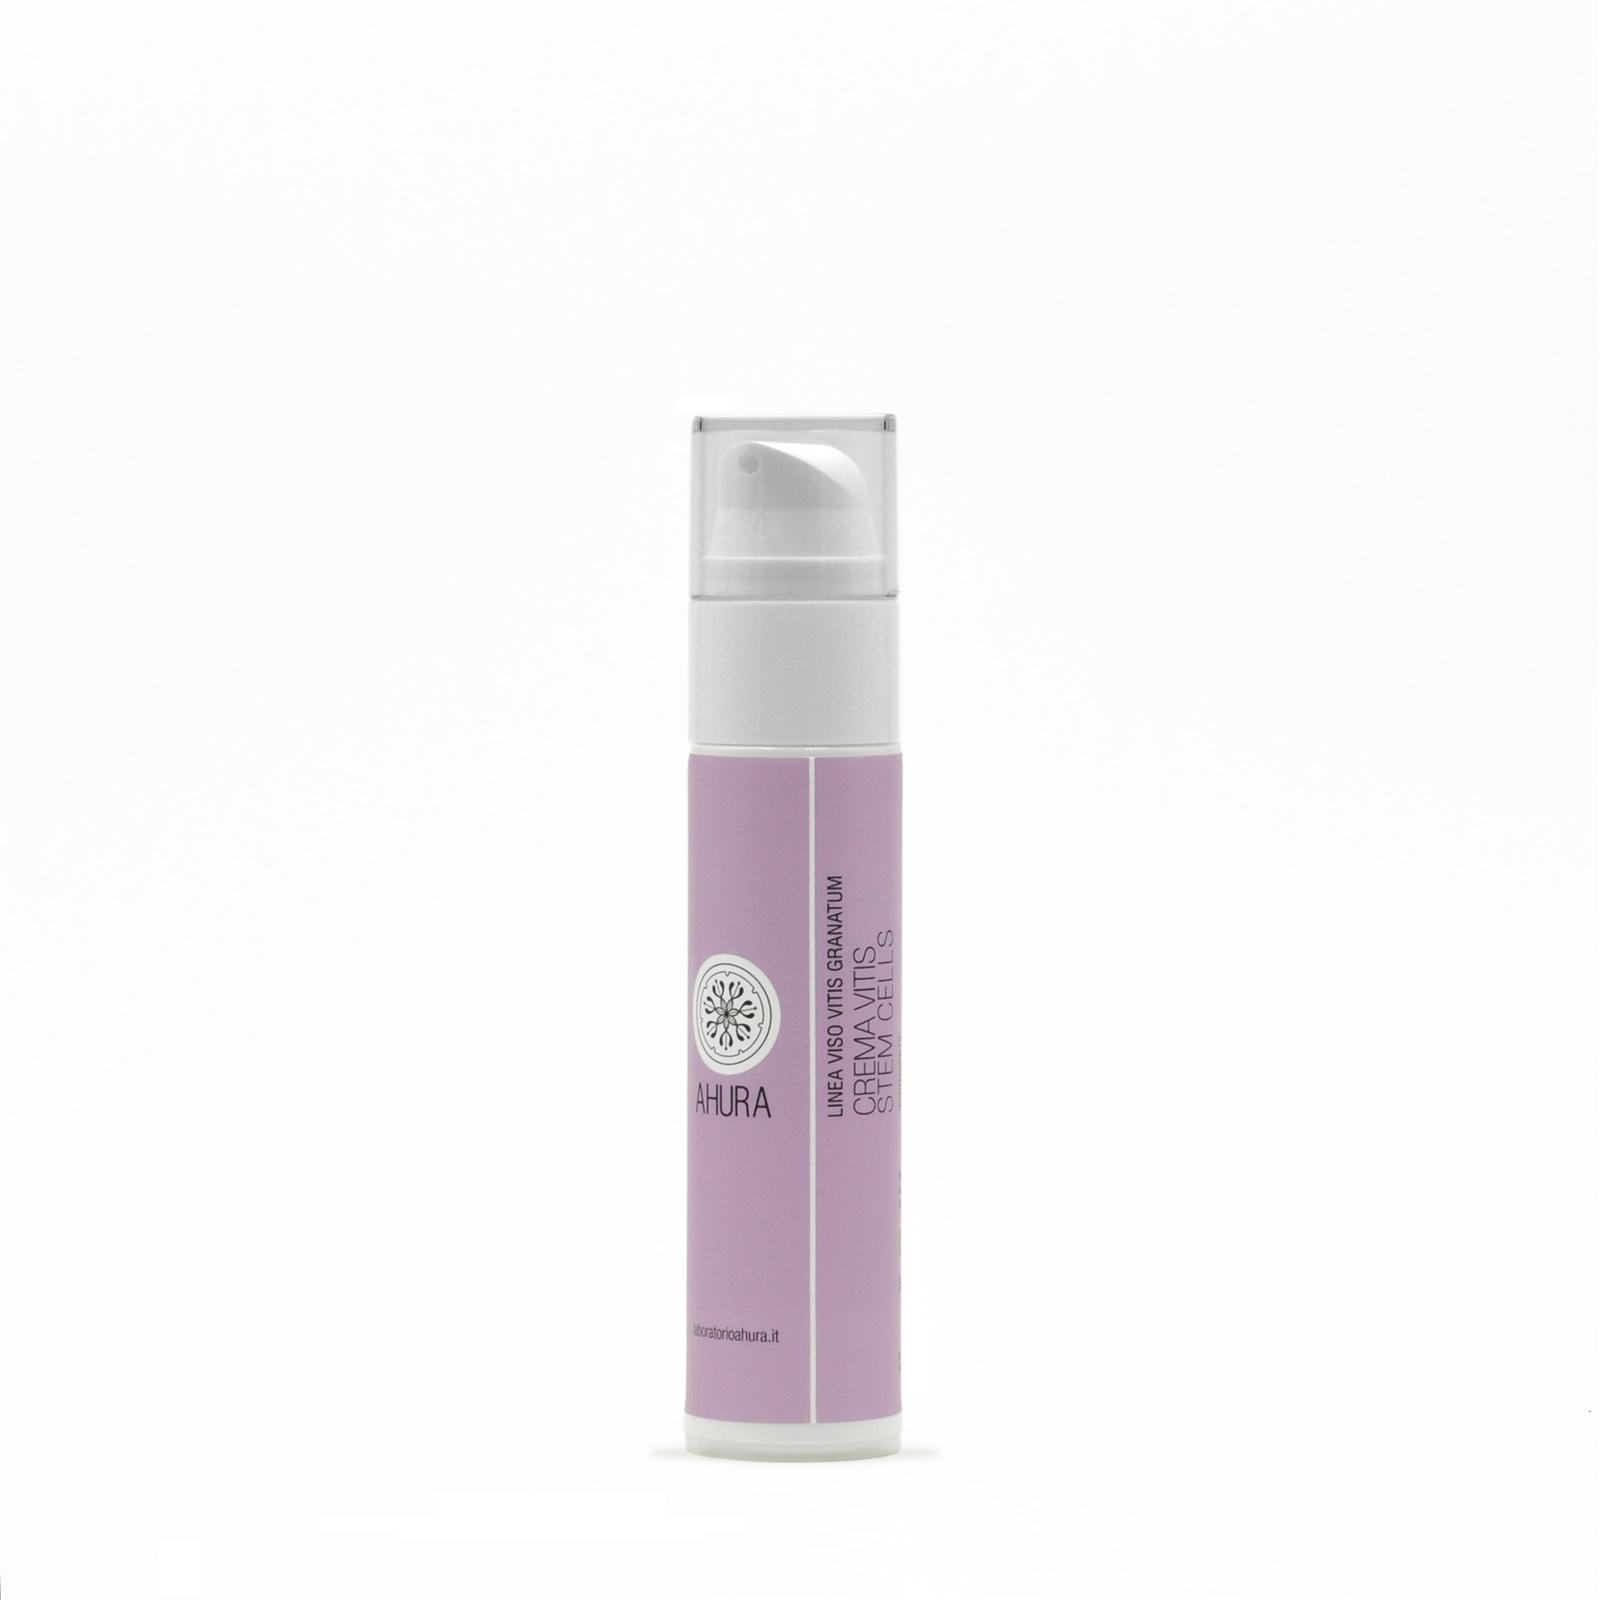 A0200 crema vitis stem cells 01 - Ahura